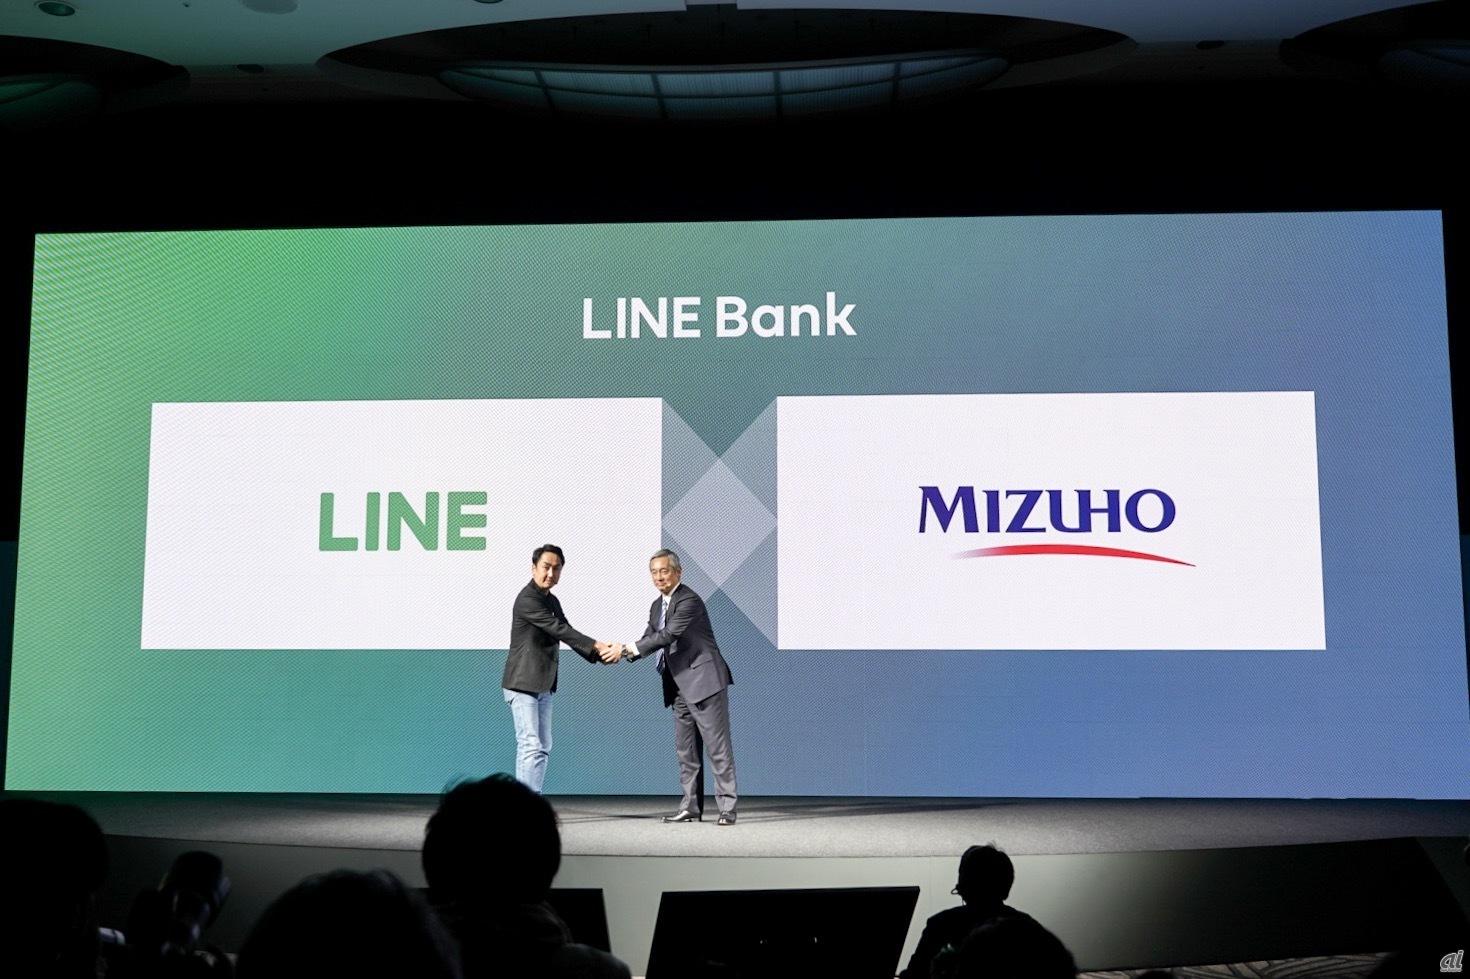 LINE Financialとみずほ銀行がLINE Bankという名の銀行設立で合意